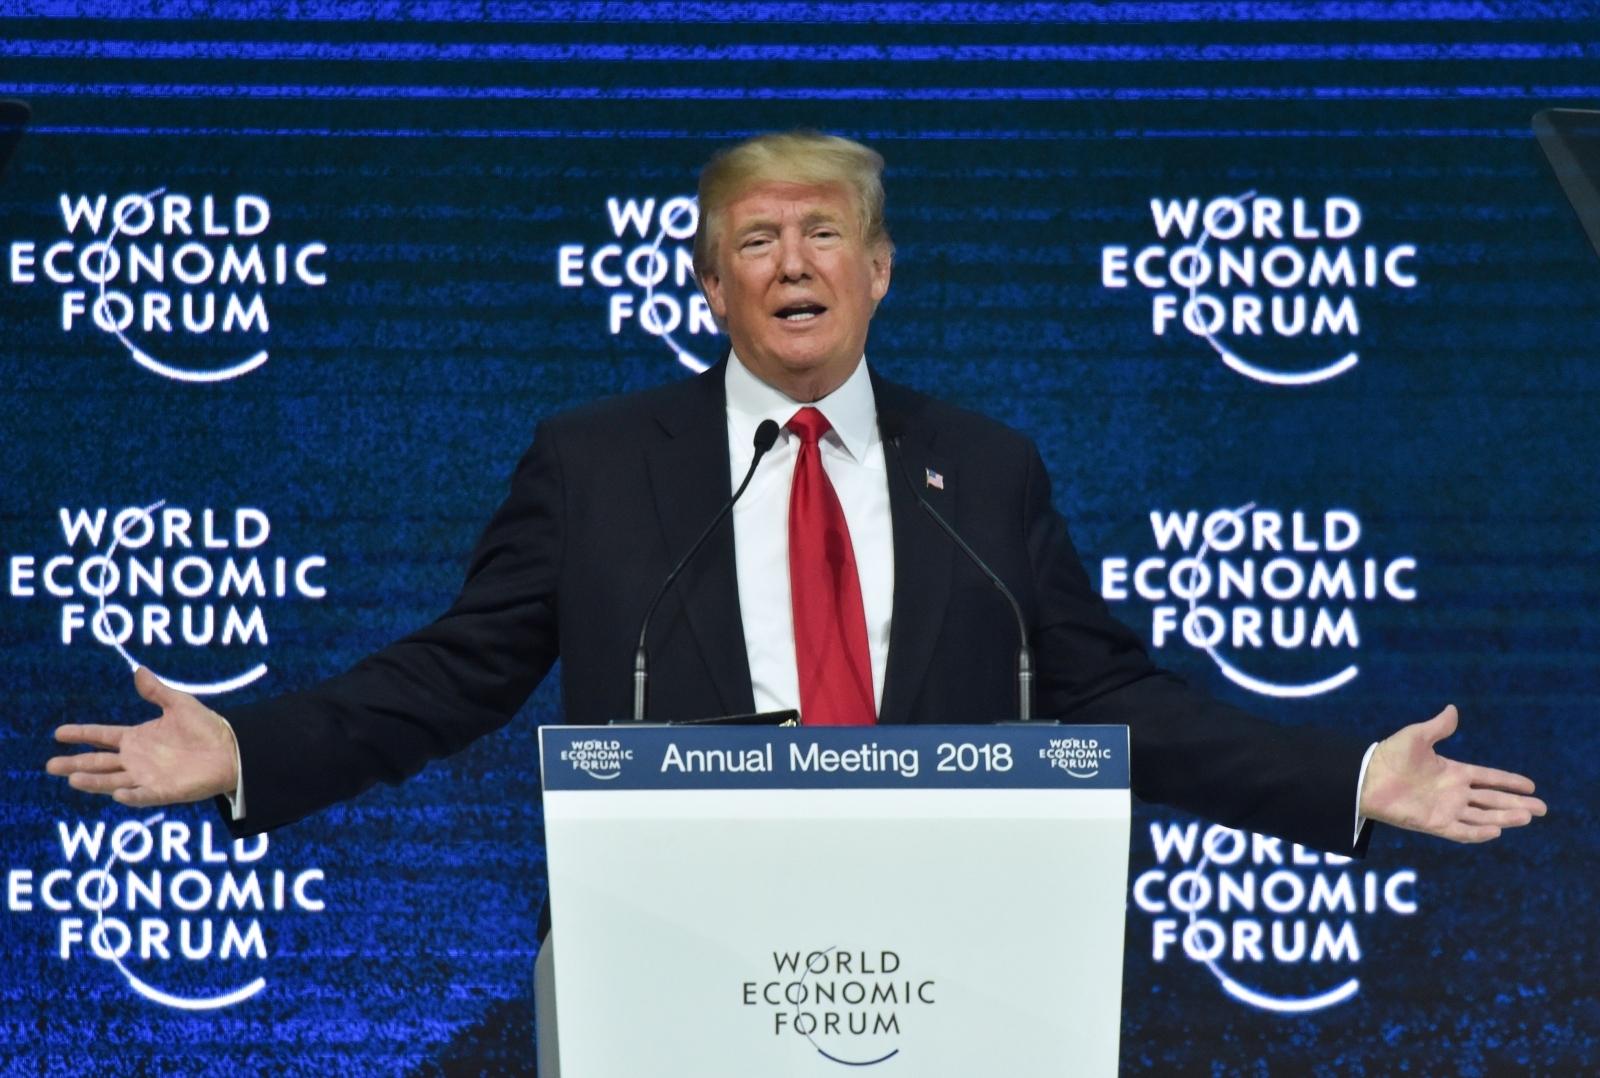 Donald Trump at the World Economic Forum